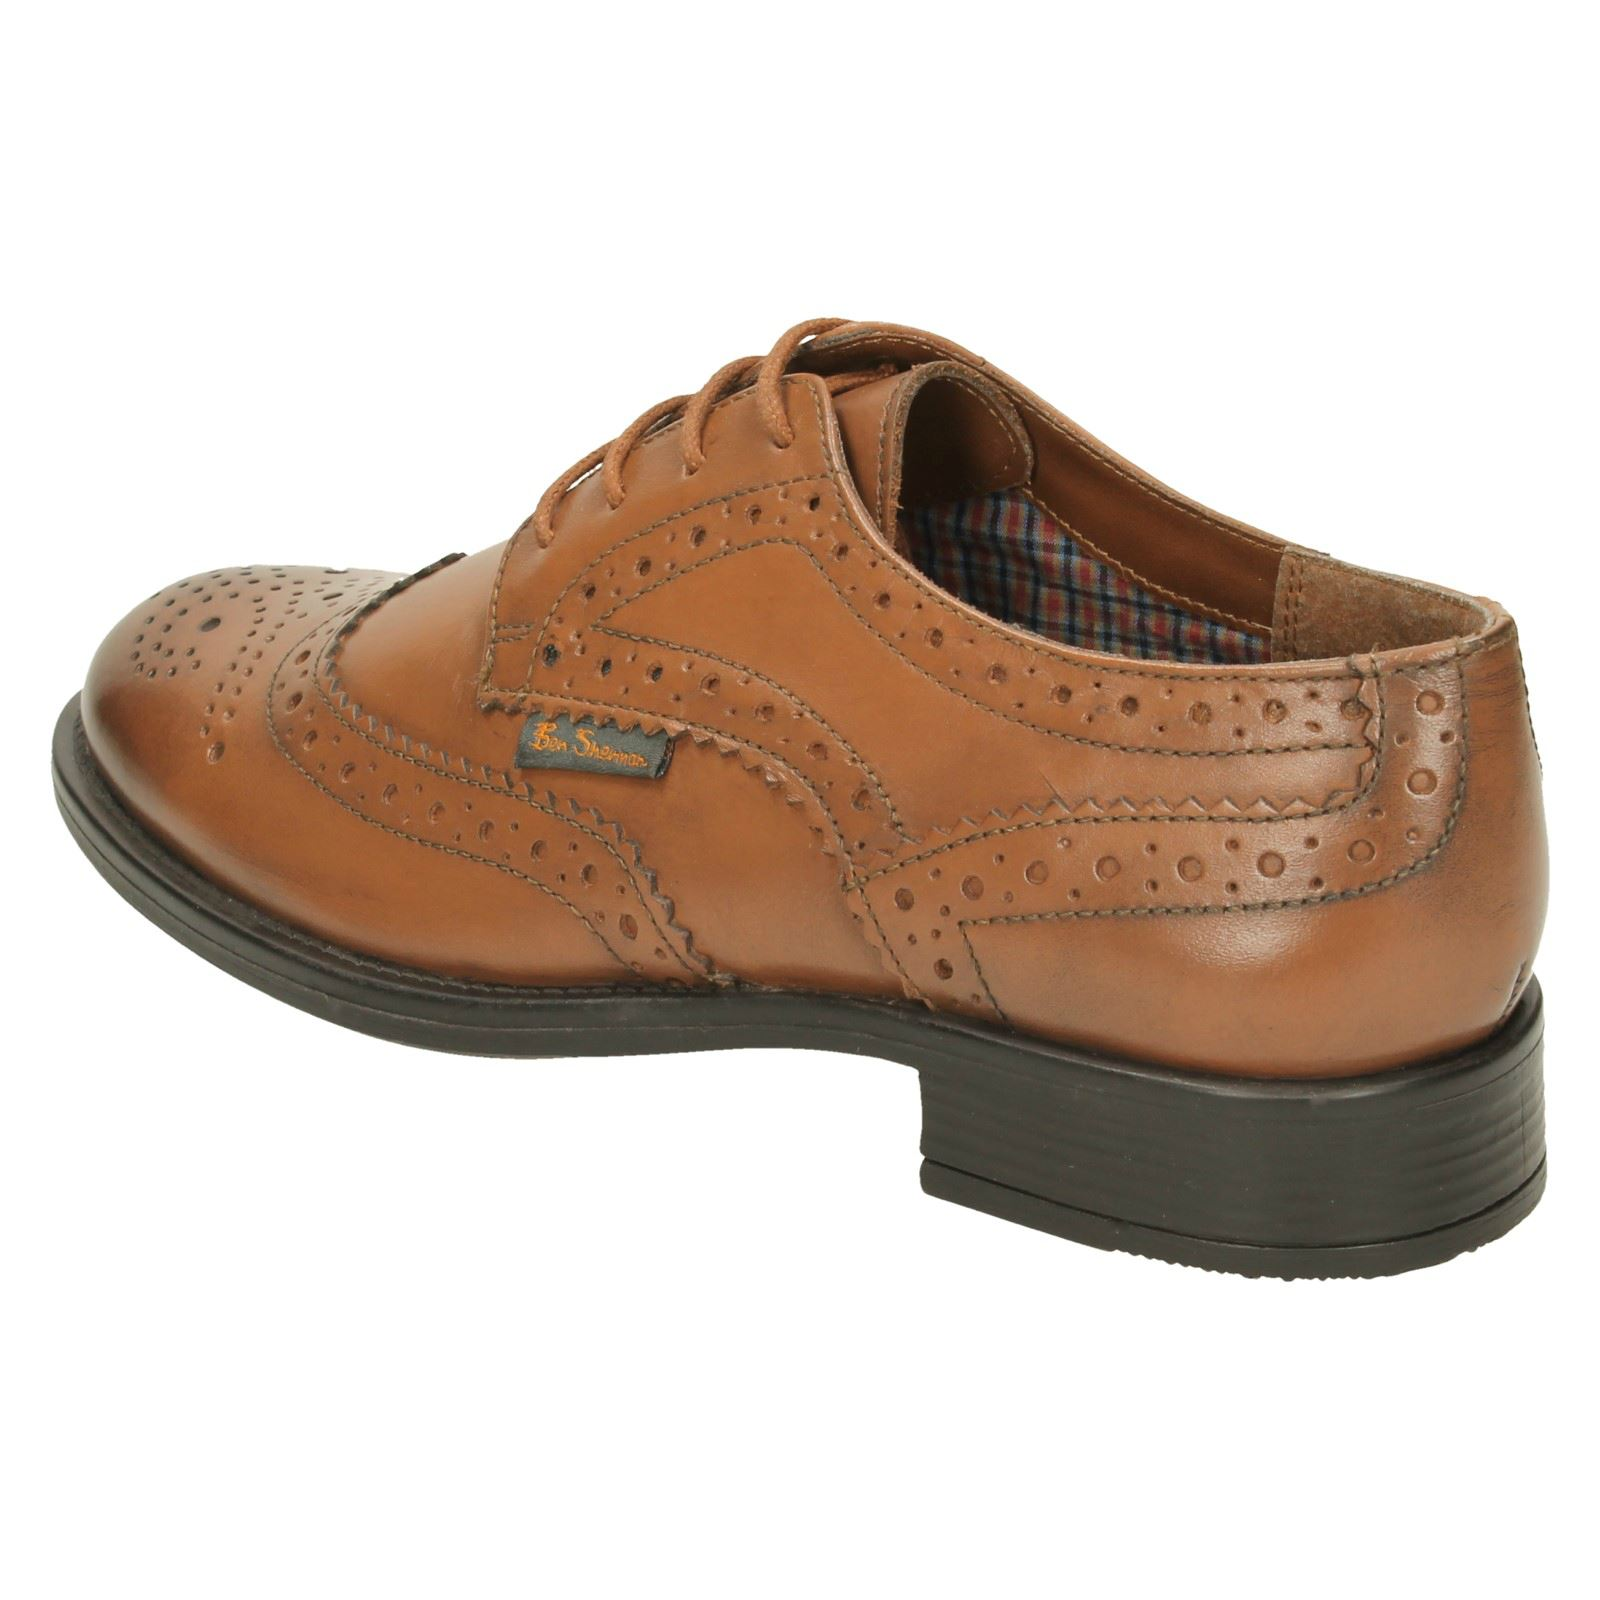 Simpson Ben Sherman Mens Formal Shoes